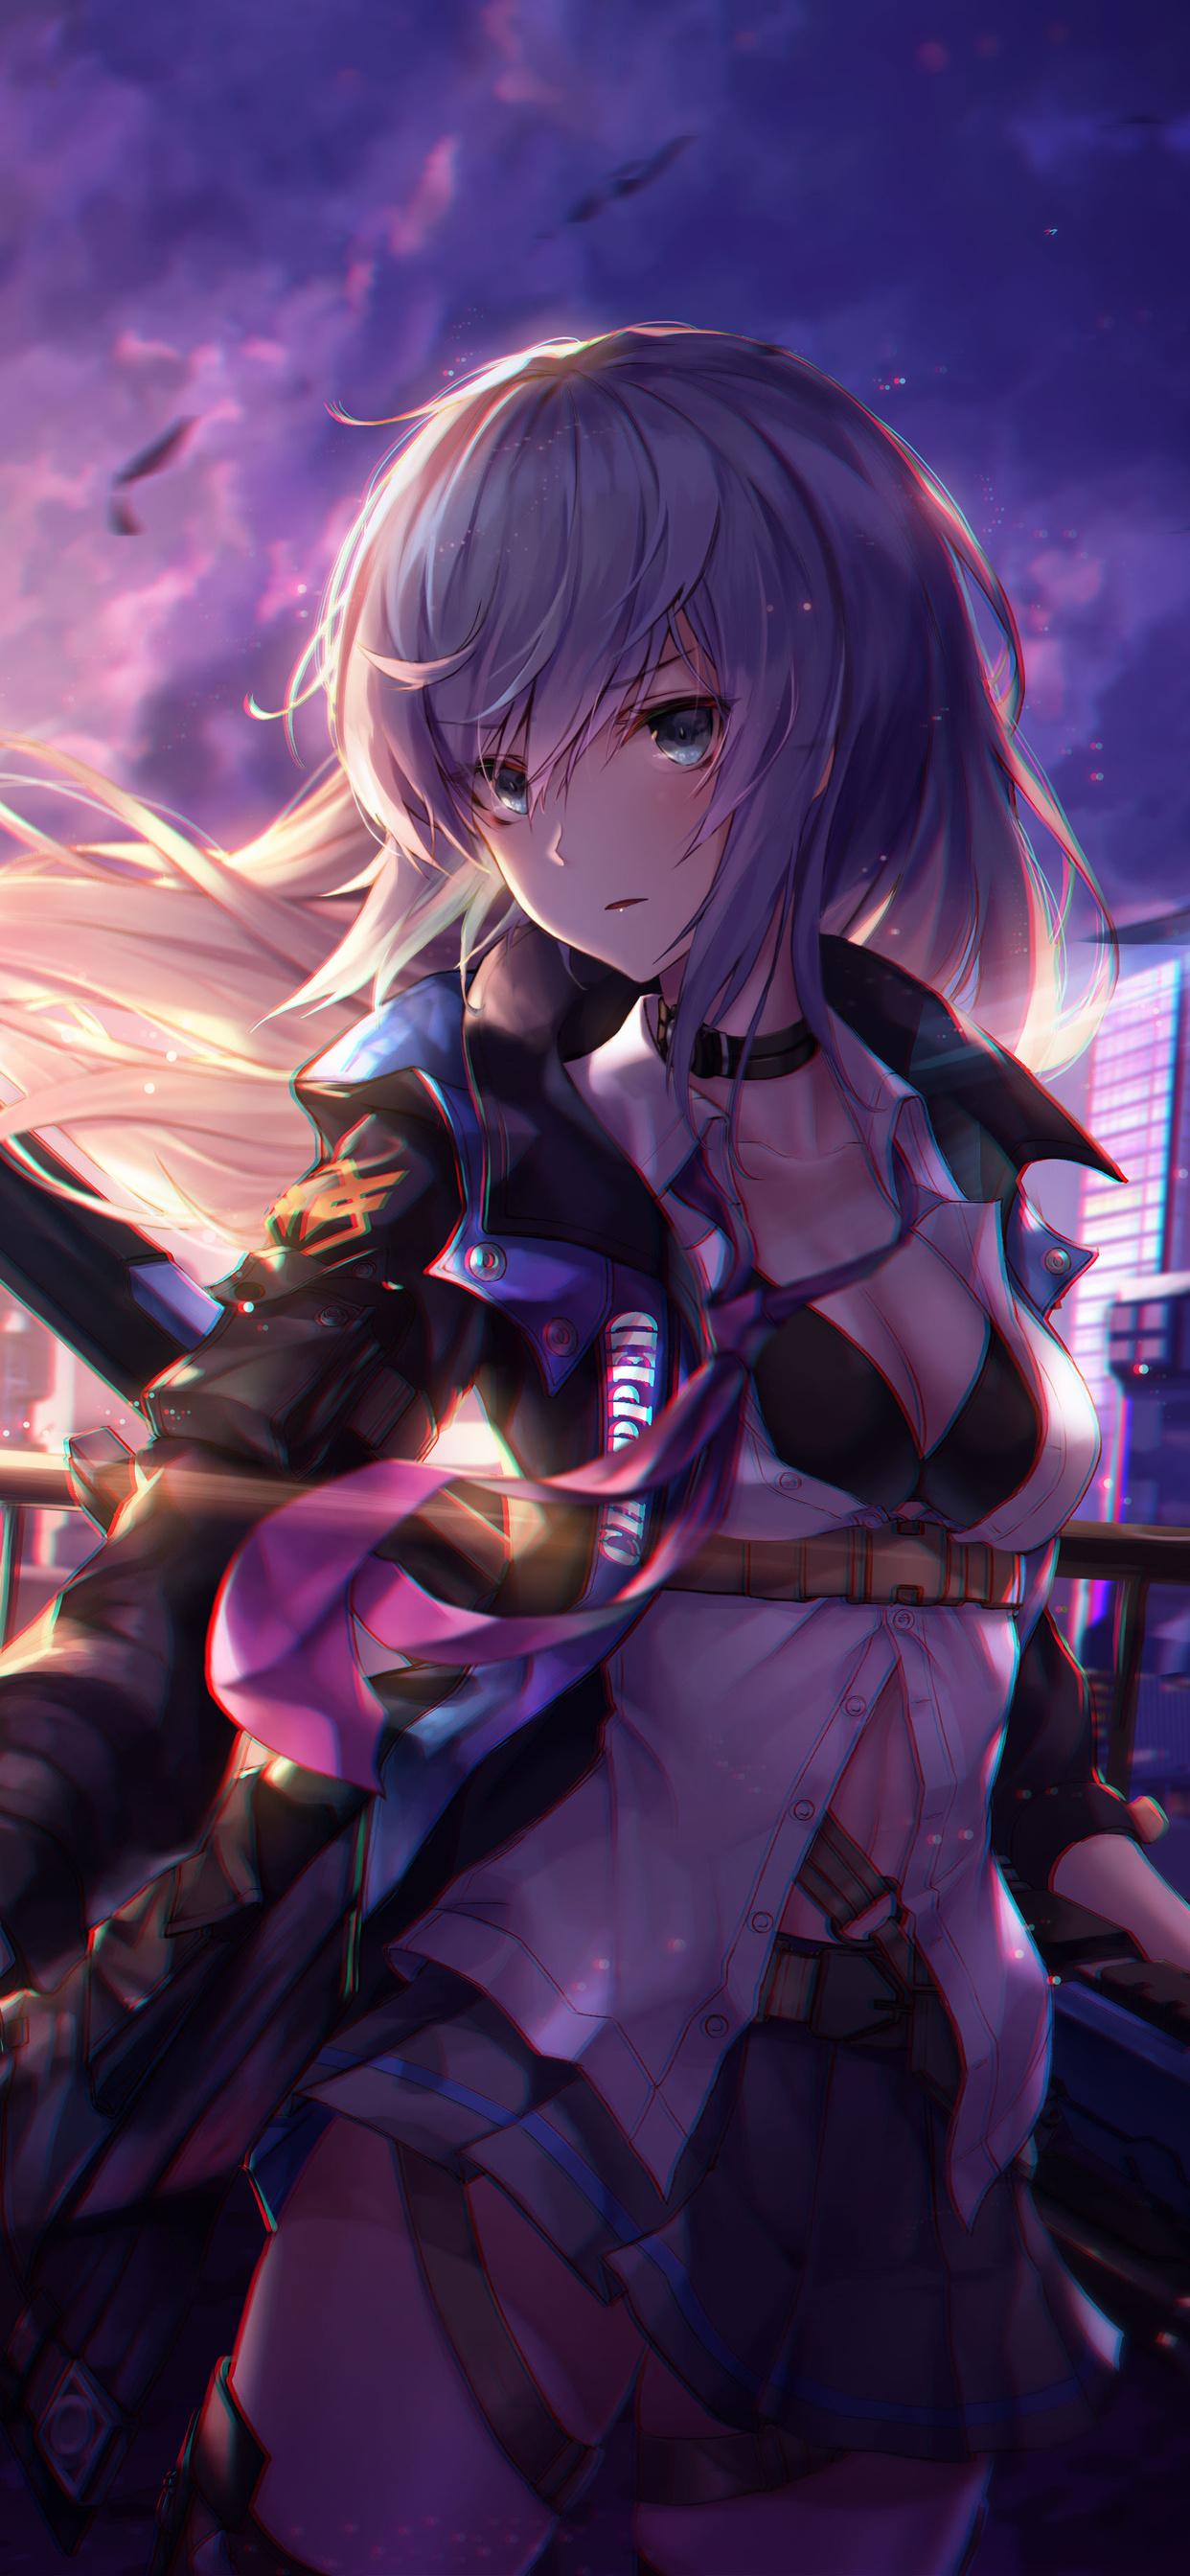 Anime Wallpaper Iphone Xs Max